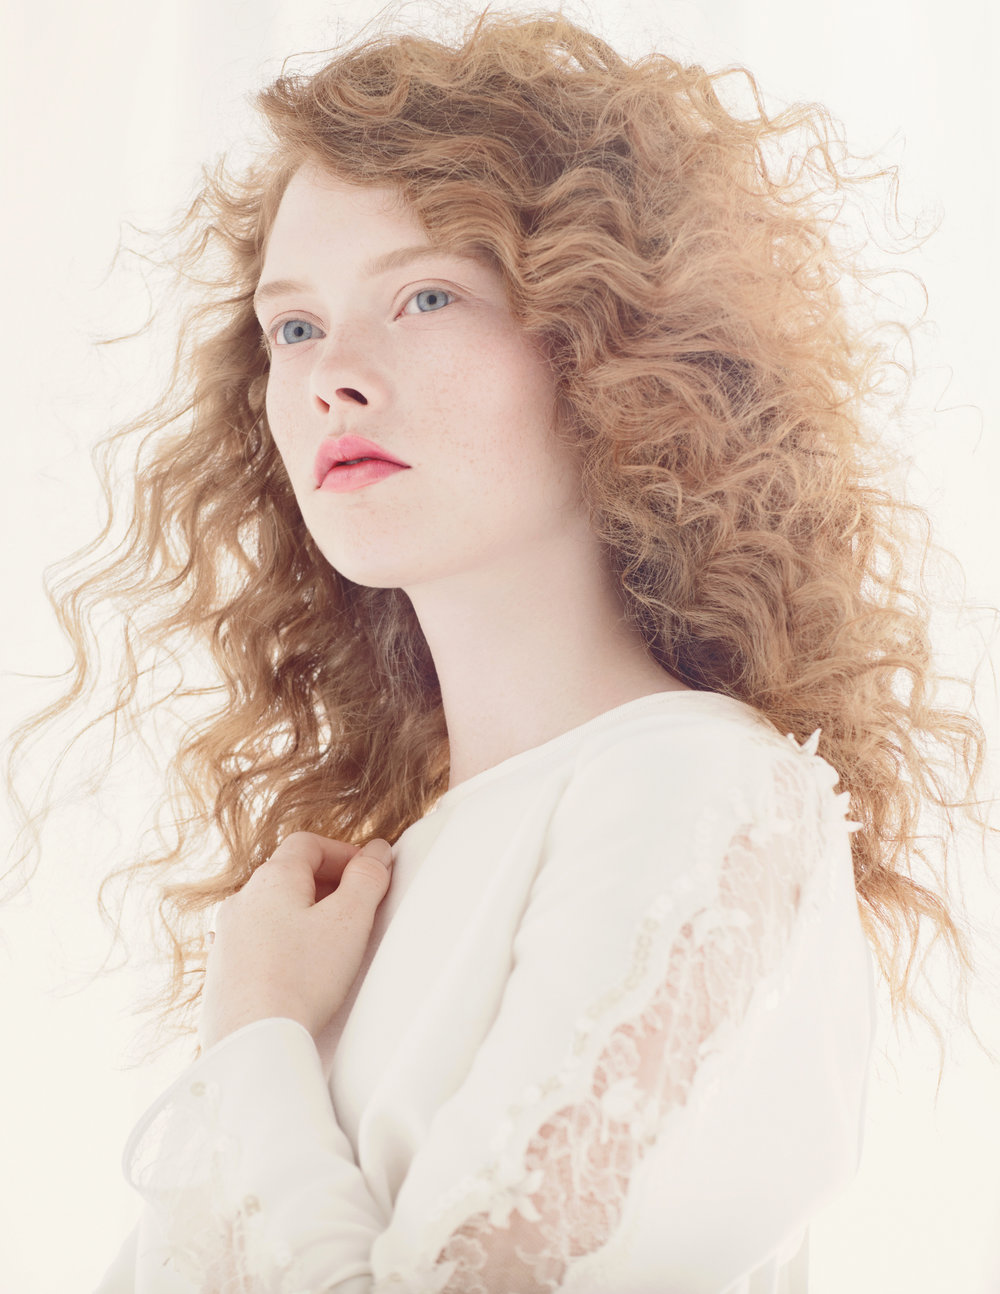 1-Emily-Bess-Marta-McAdams-Taylor-Greene-Atlas-Magazine.jpg